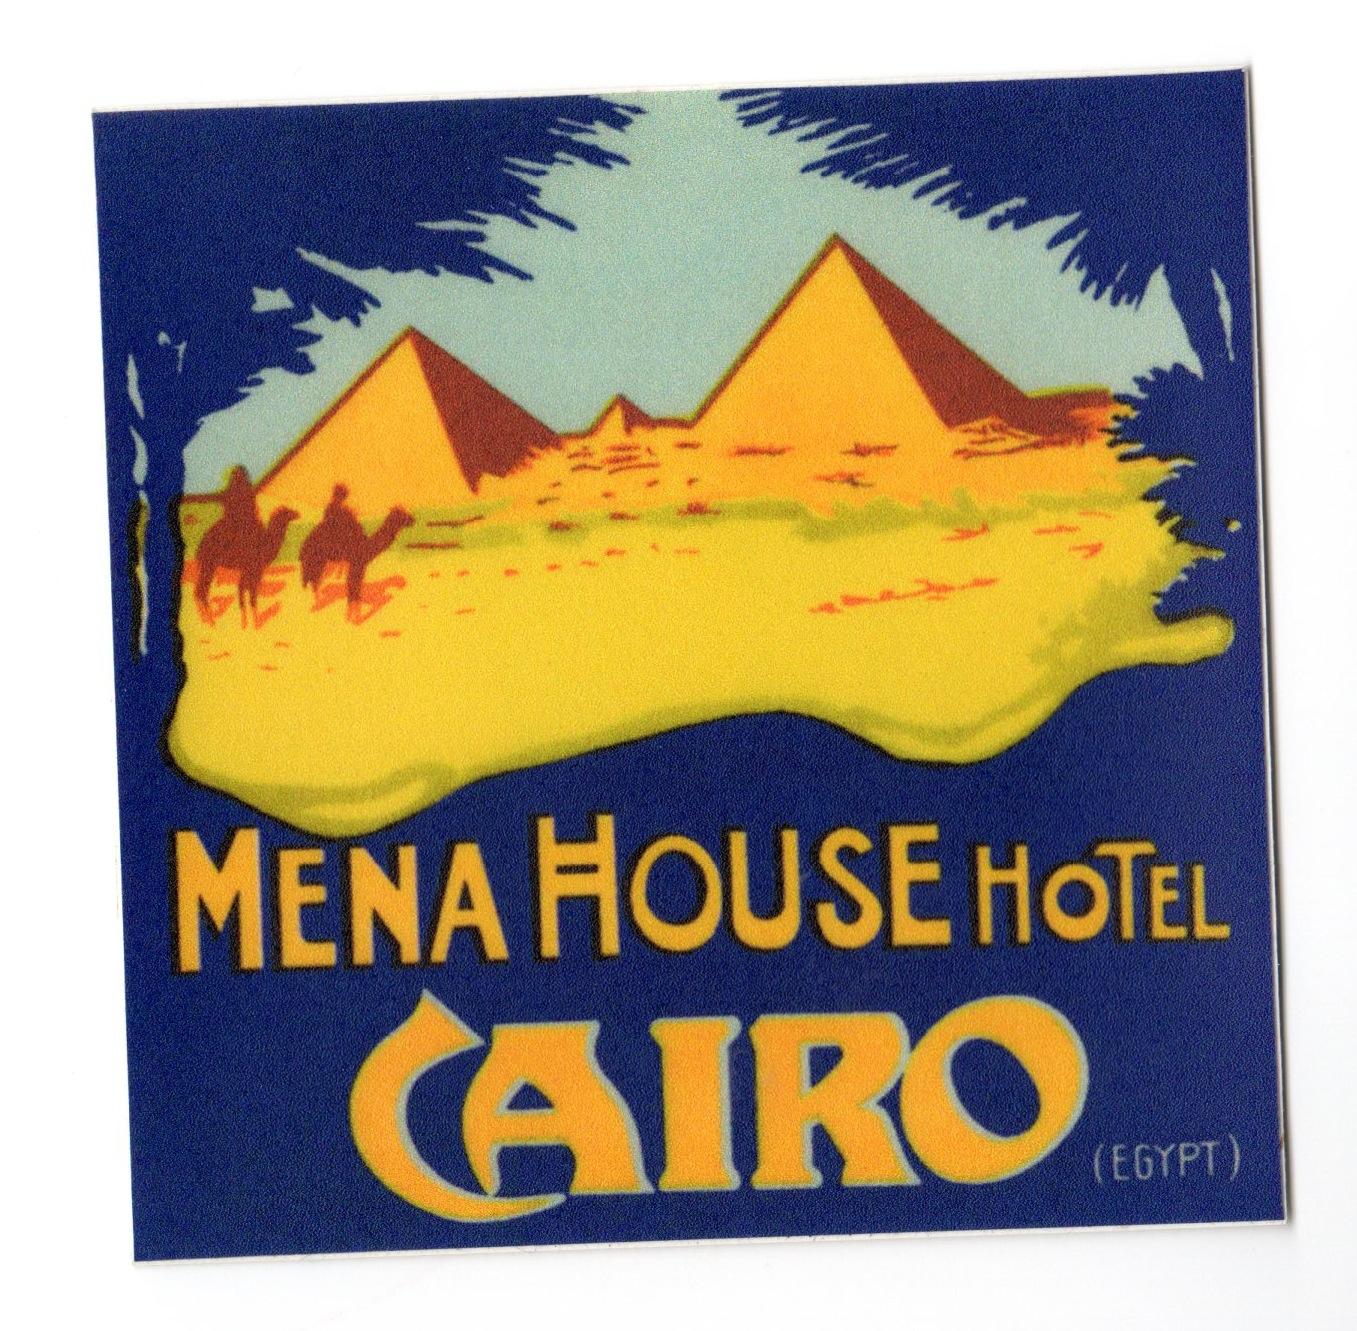 Mena House hotel sticker